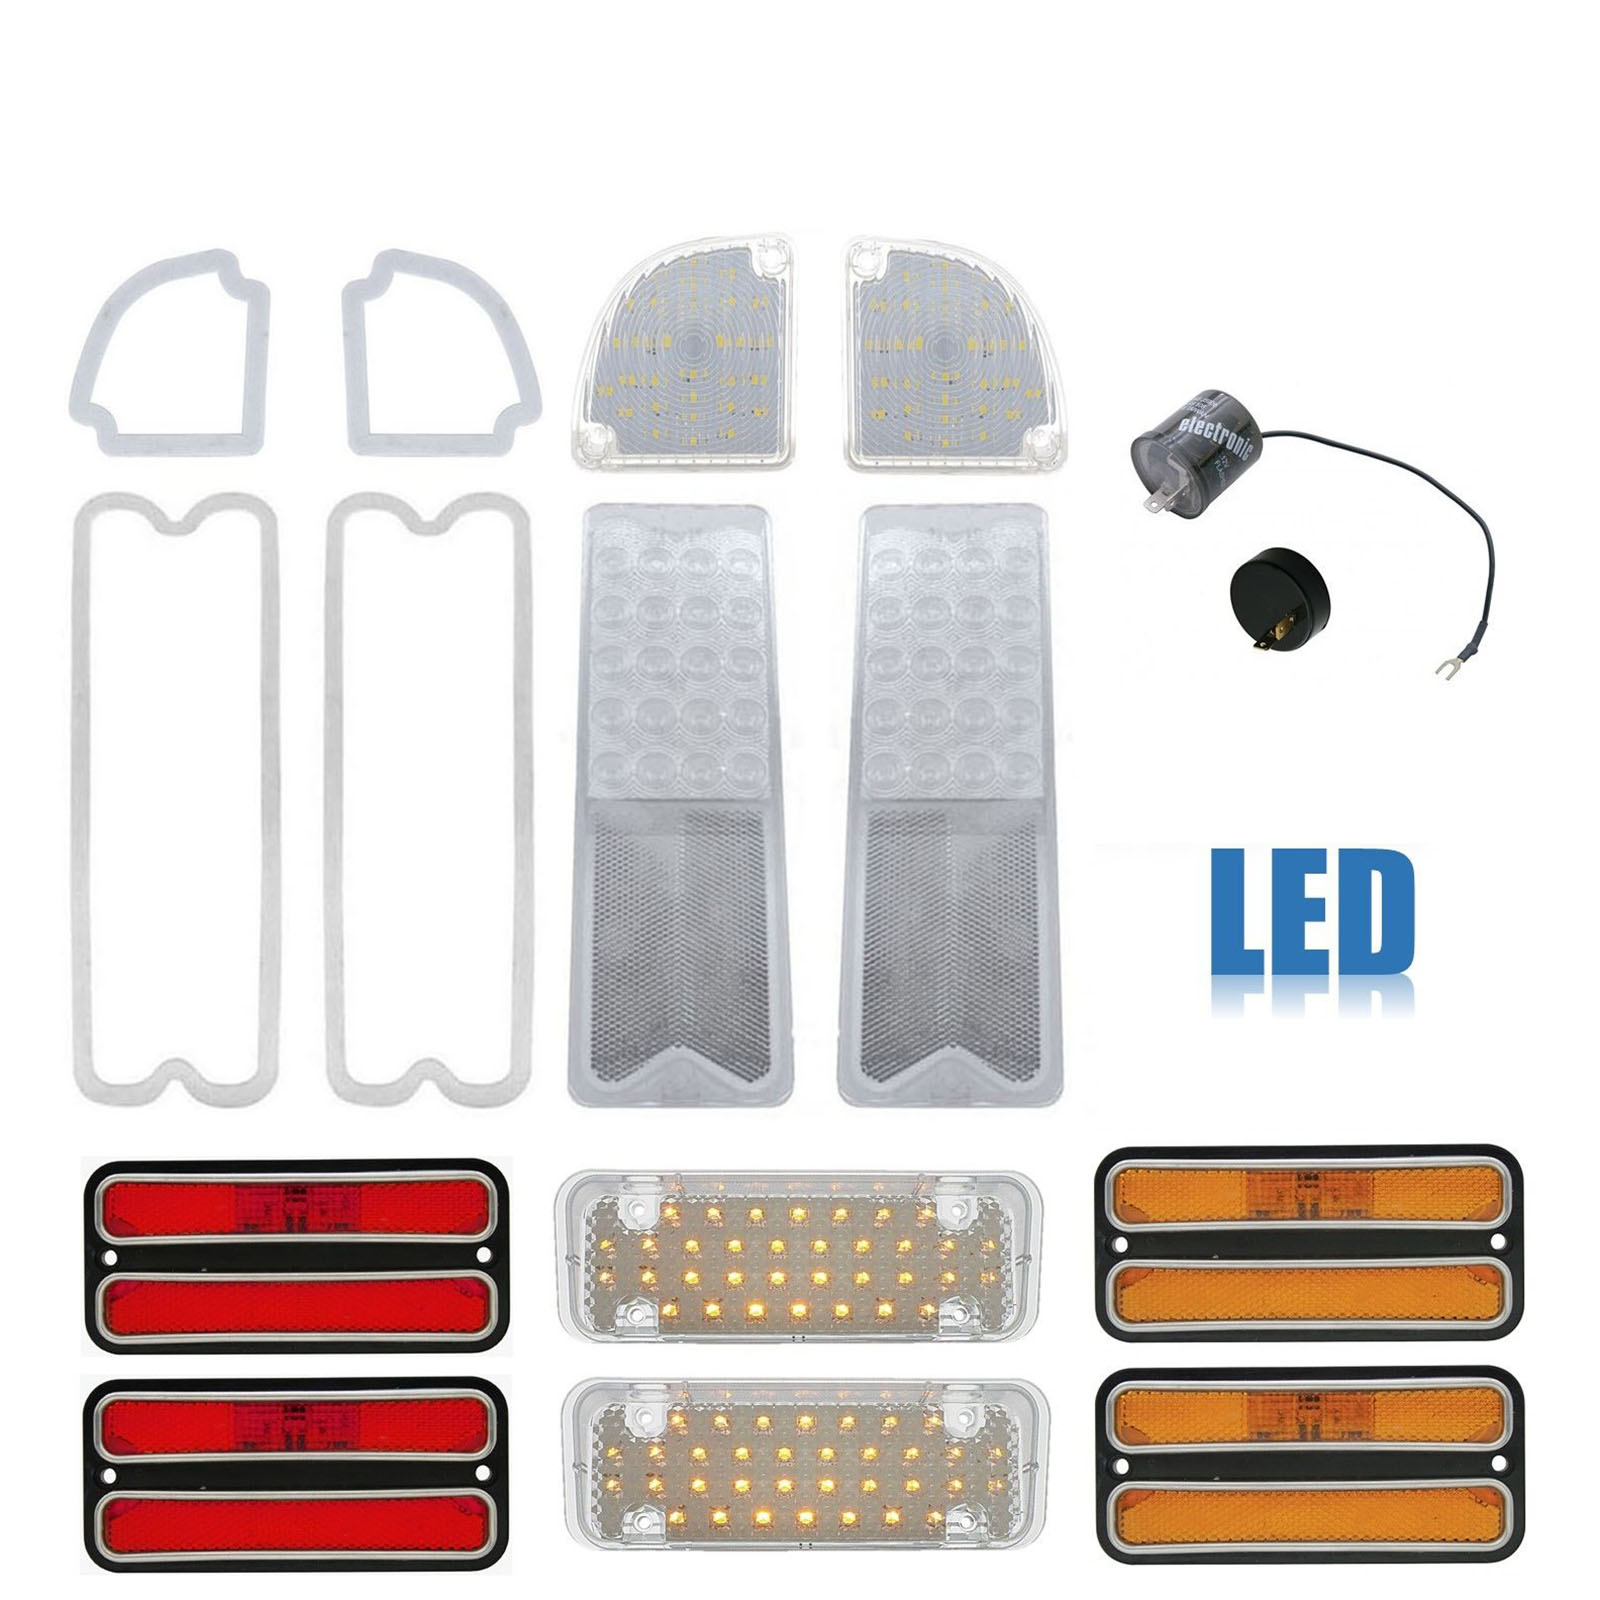 71-72 Chevrolet Chevy Truck parklamp  lens gasket pair